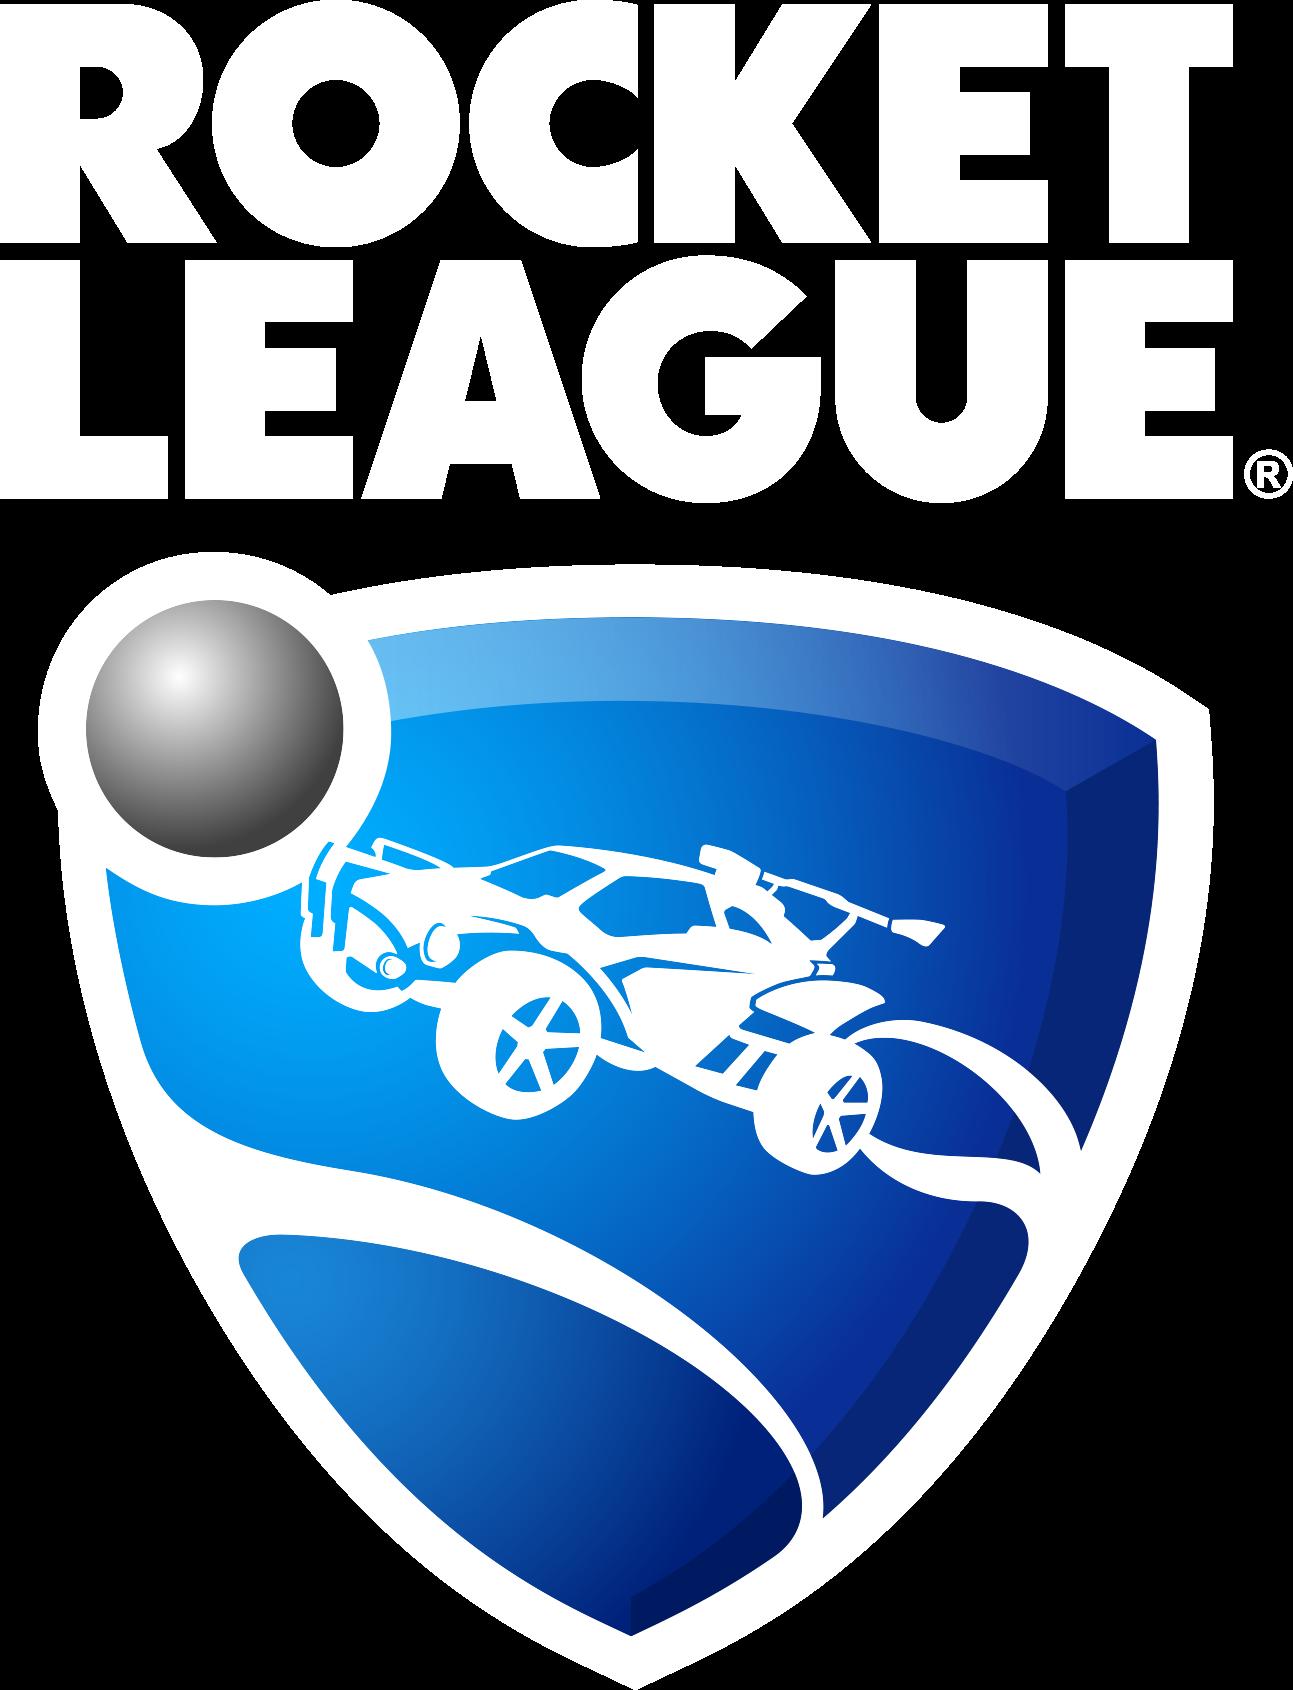 Play league official site. Clipart rocket cool rocket